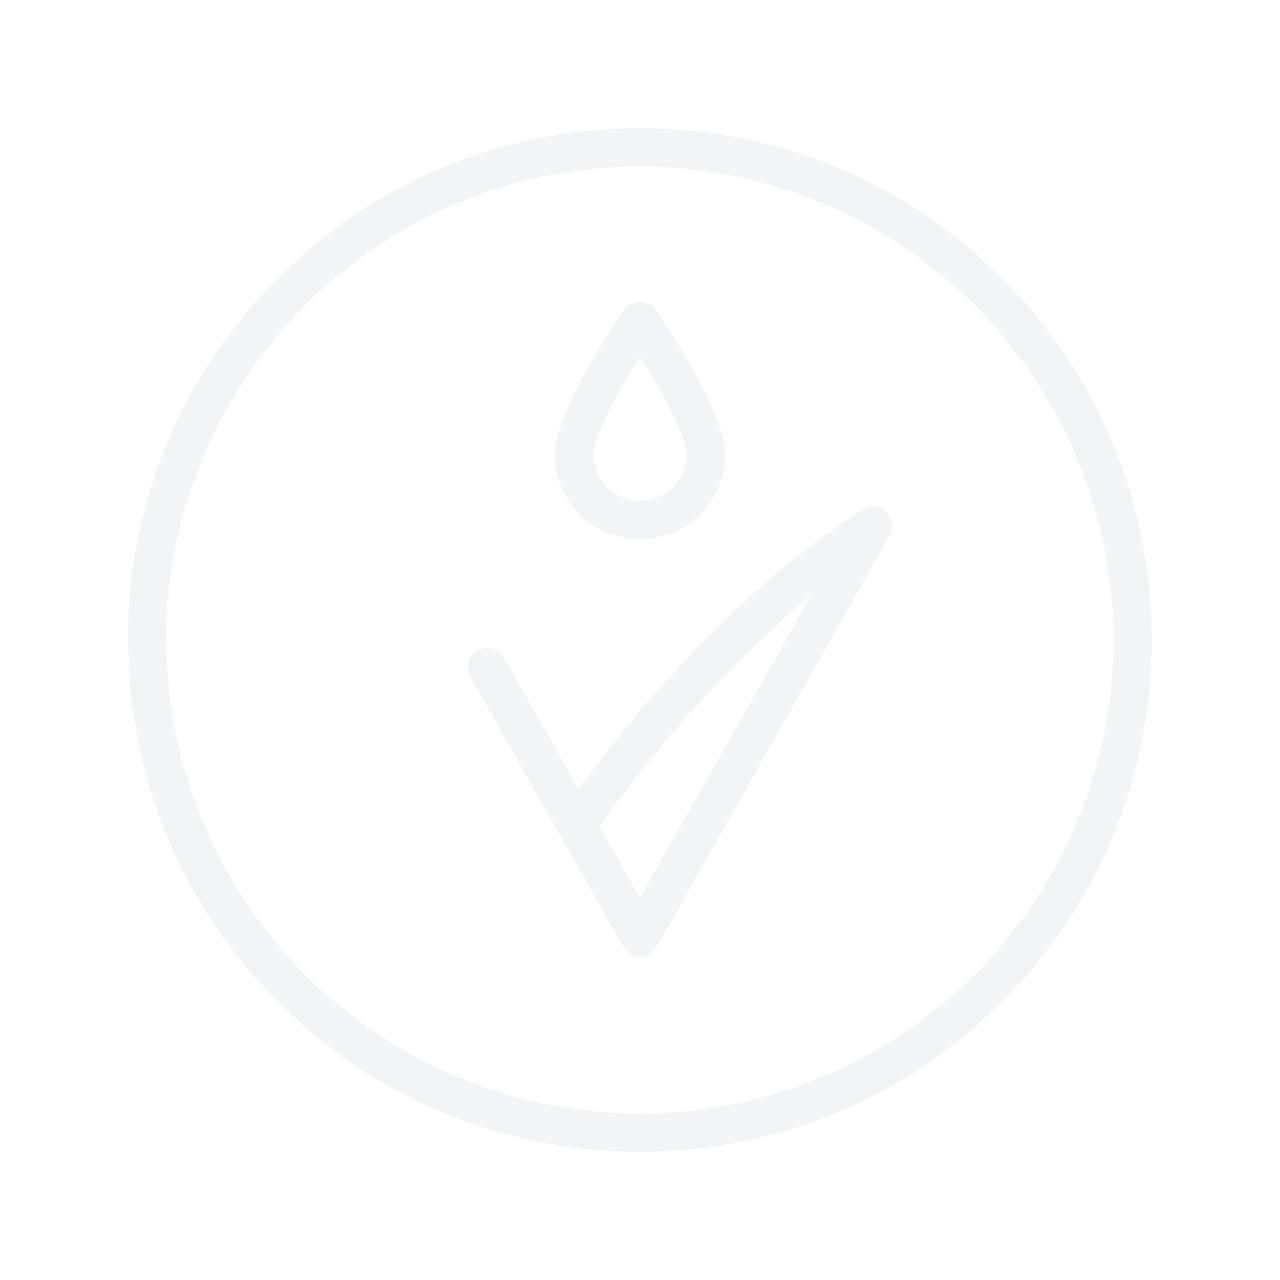 BIODROGA Oxygen 24h Care (Oily/Combination Skin) 50ml